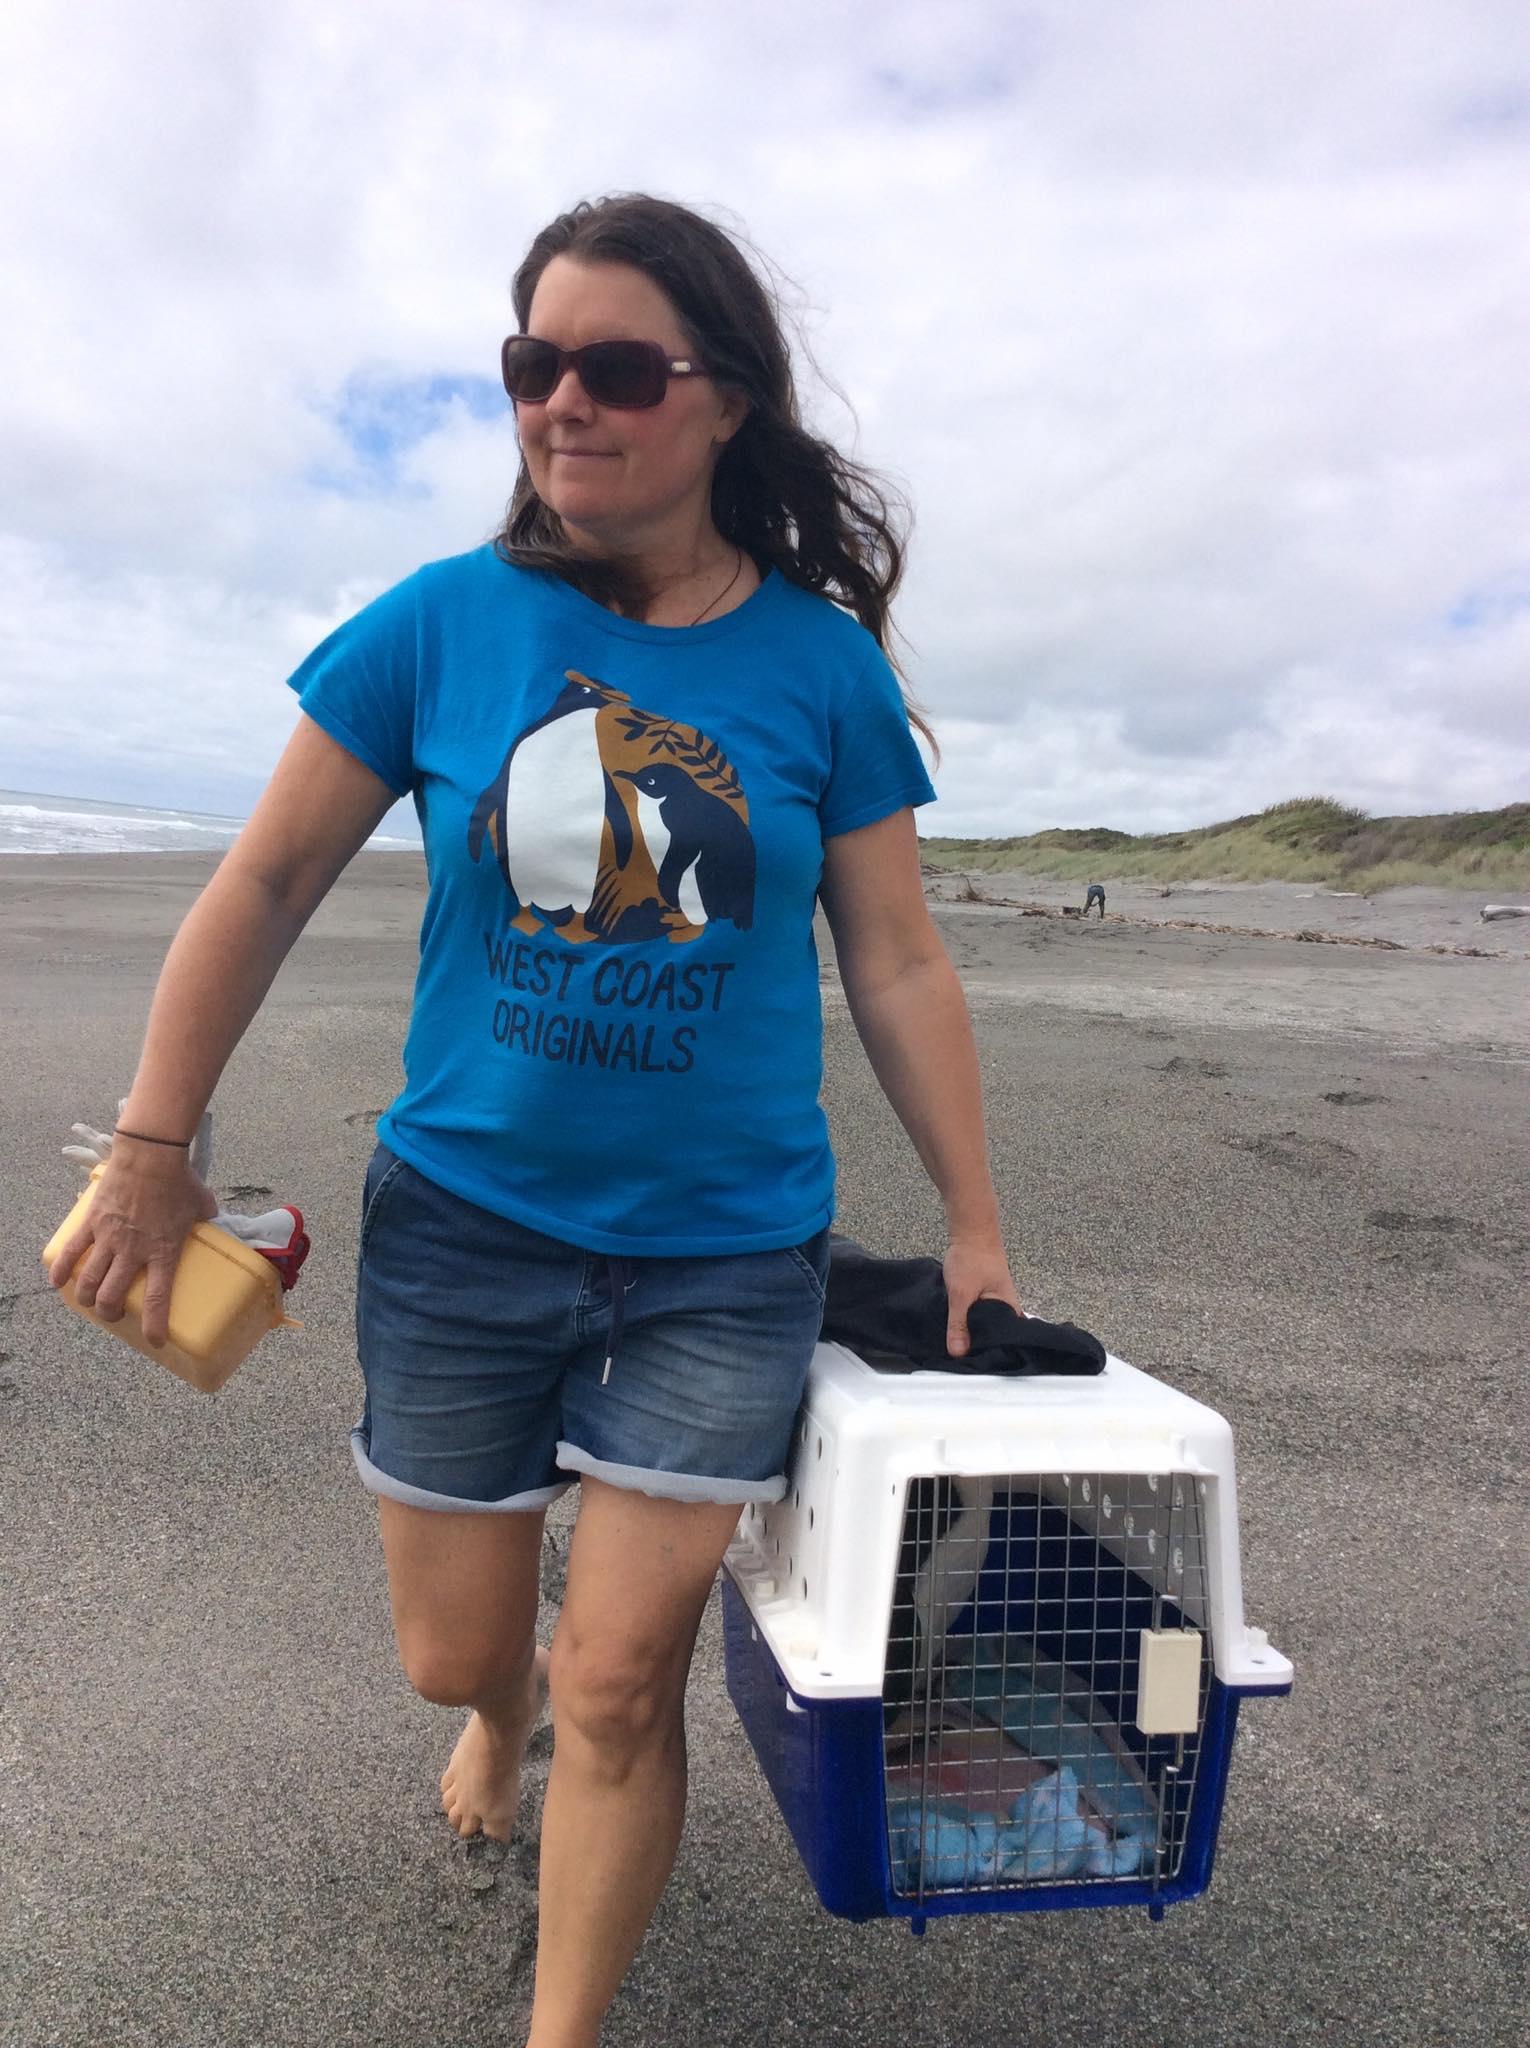 Tracy returns Falcon the tawaki to the beach